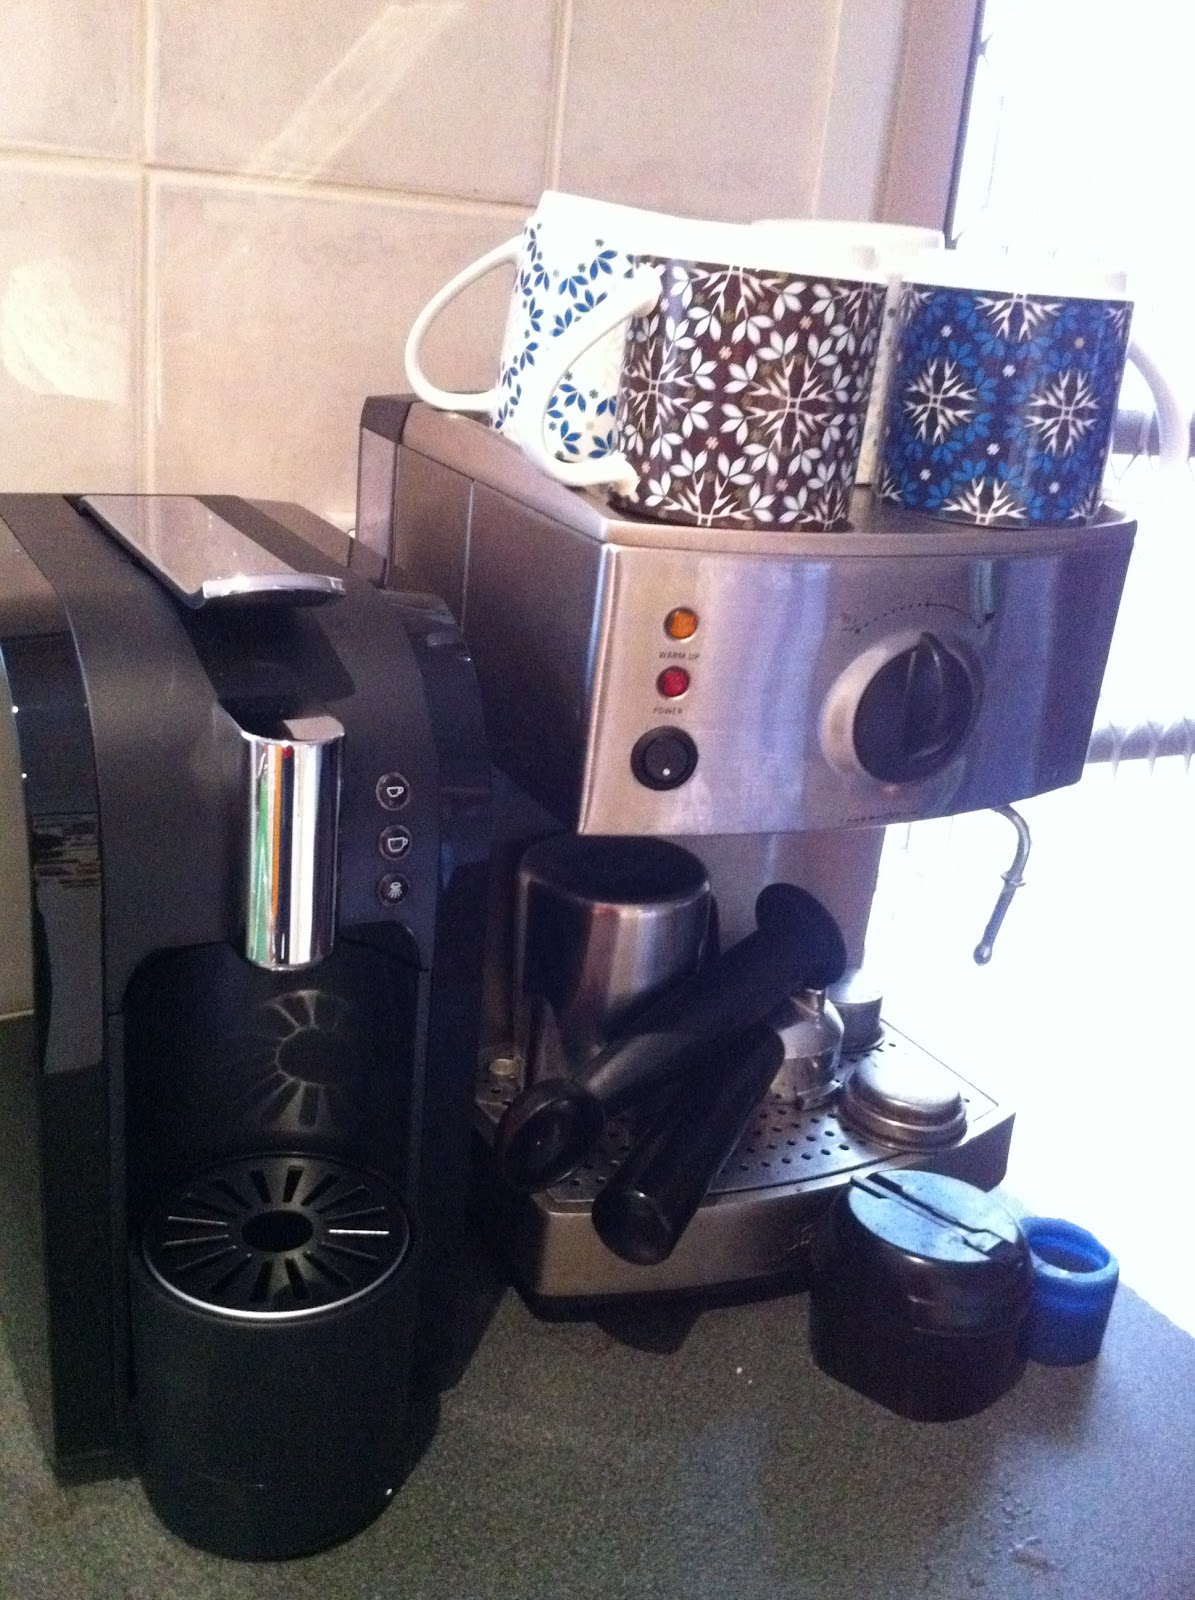 aldi expressi coffee machine jt 39 s hardware software reviews. Black Bedroom Furniture Sets. Home Design Ideas